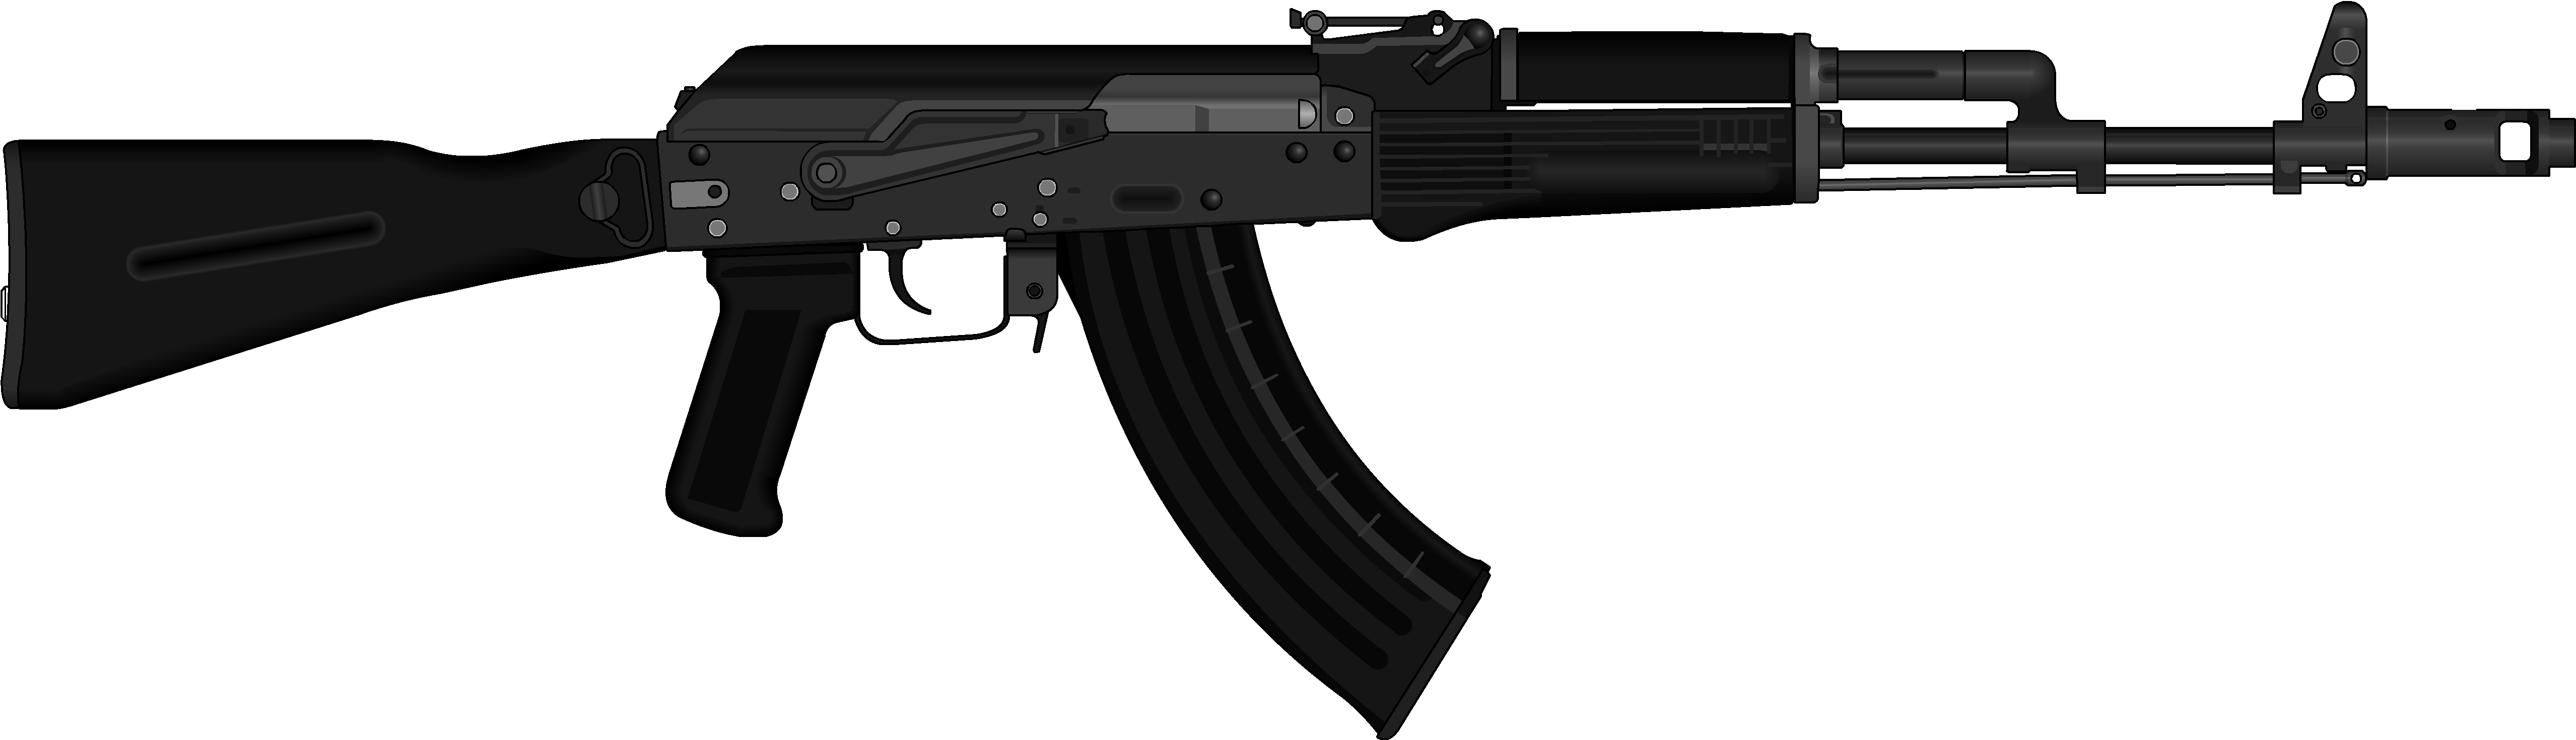 Kalashnikov's AK-103 assault rifle